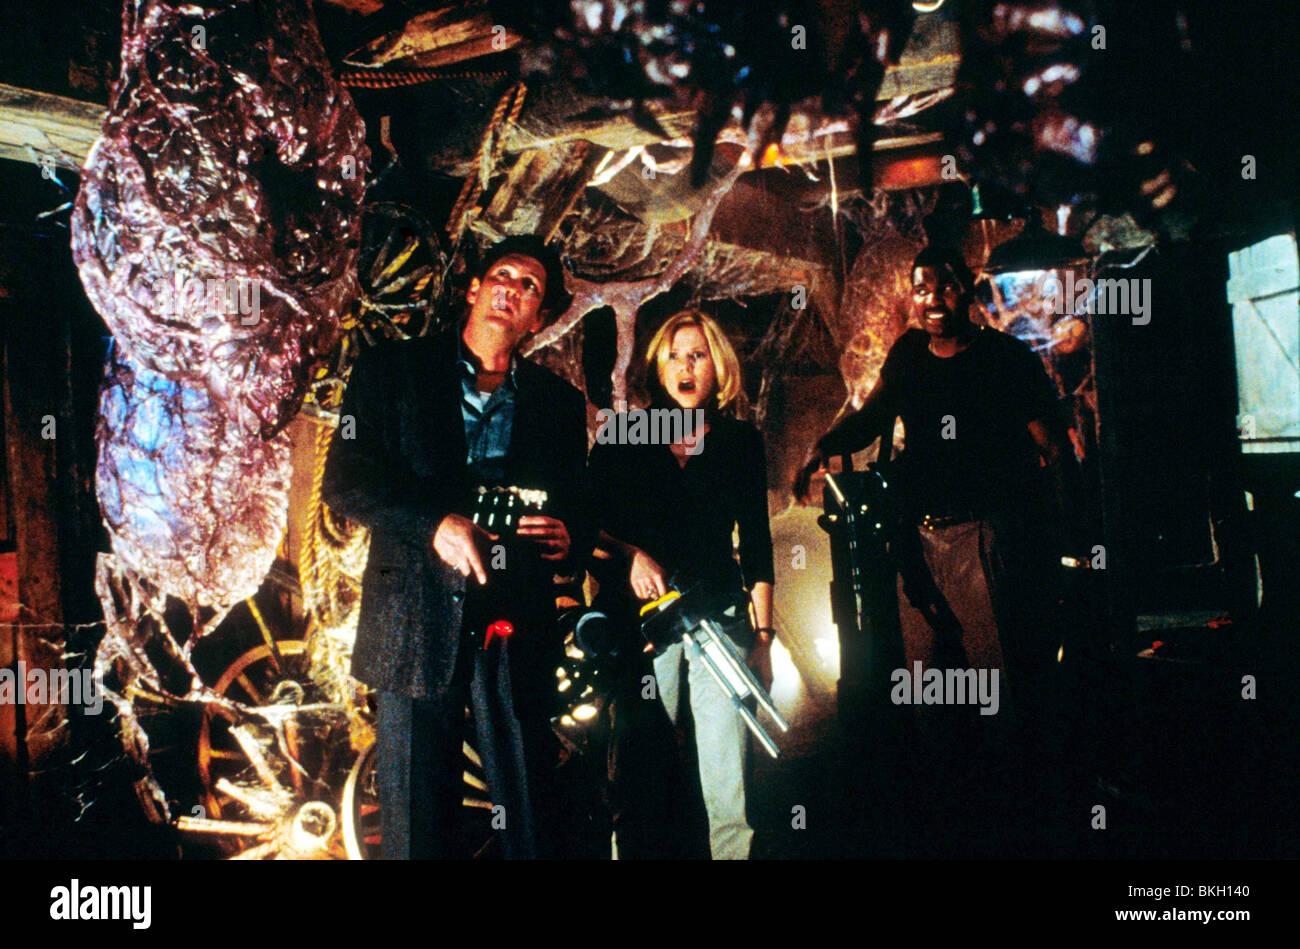 SPECIES II (1998) SPECIES 2 (ALT) MICHAEL MADSEN, MARG HELGENBERGER, MYKELTI WILLIAMSON SPE2 004 - Stock Image